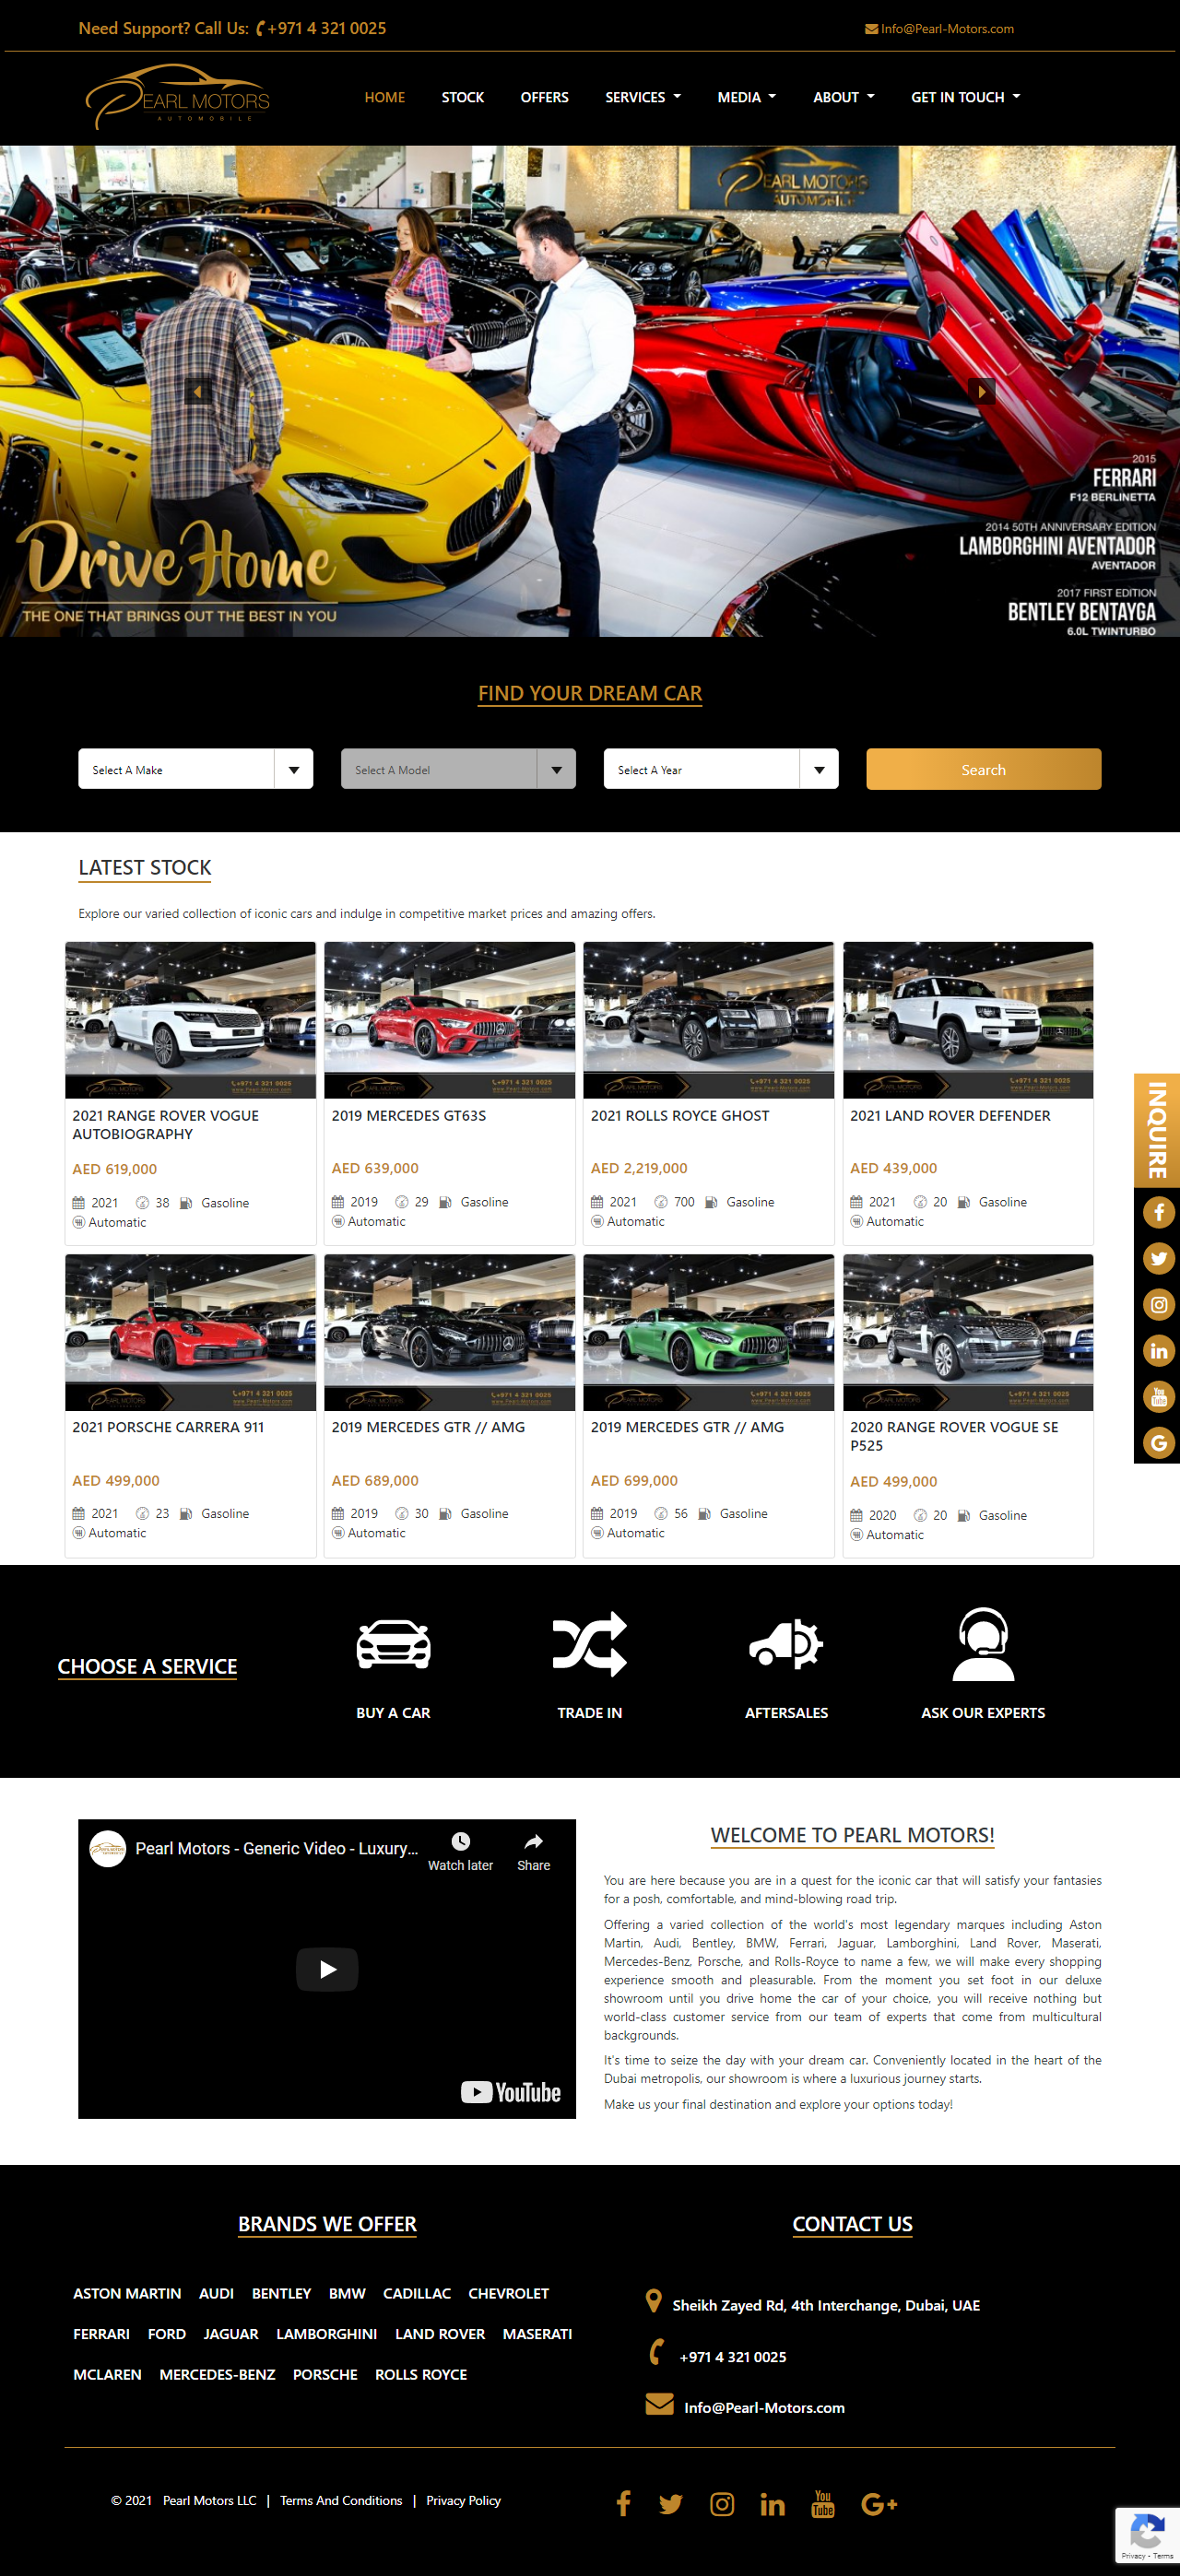 Pearl-motors-portfolio-image